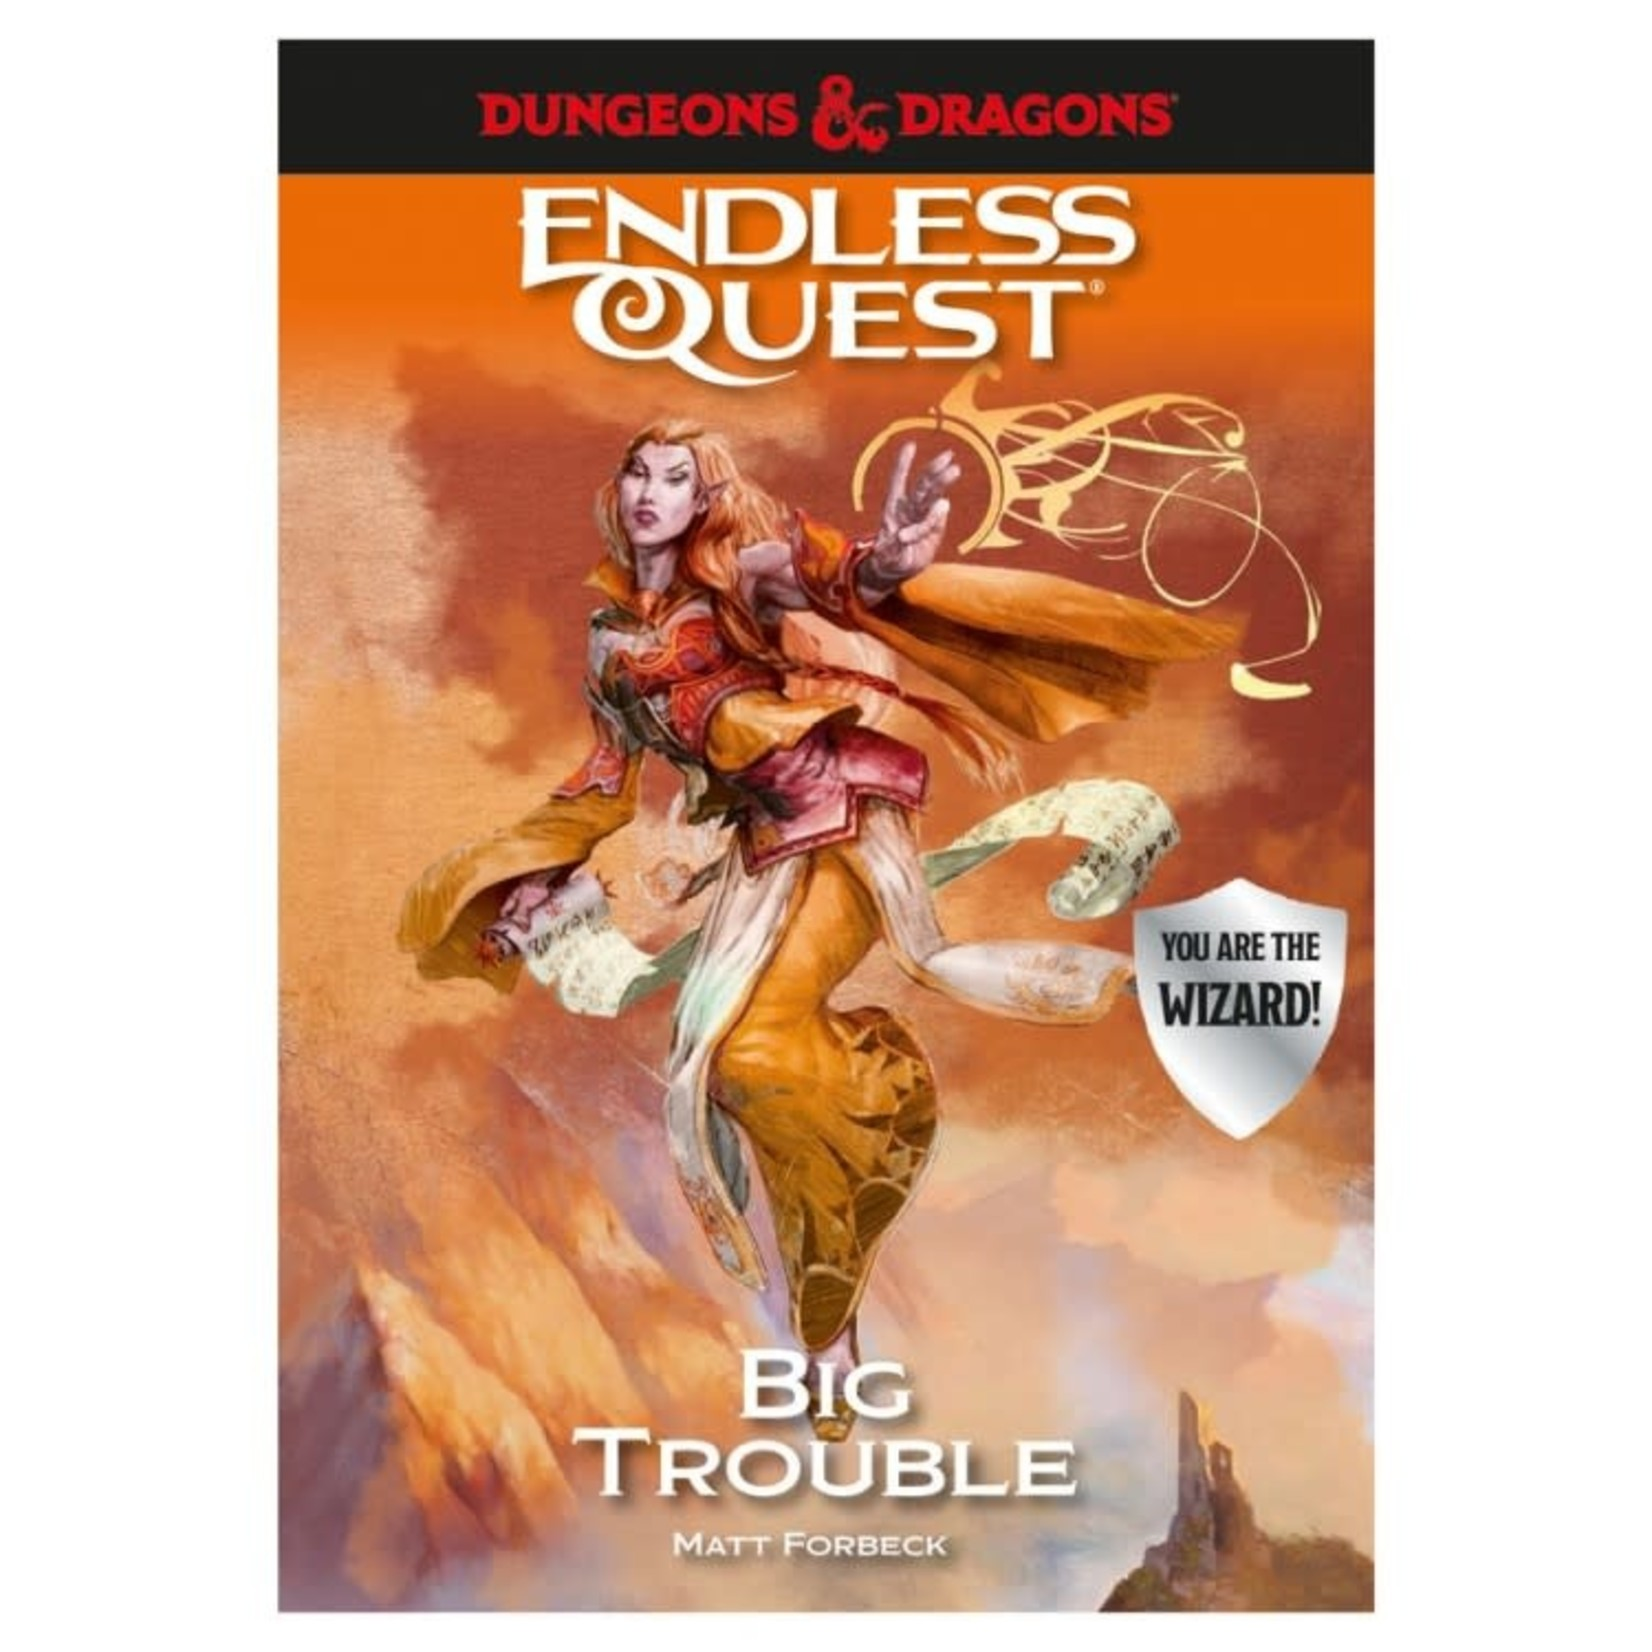 Random House Dungeons & Dragons: Endless Quest - Big Trouble